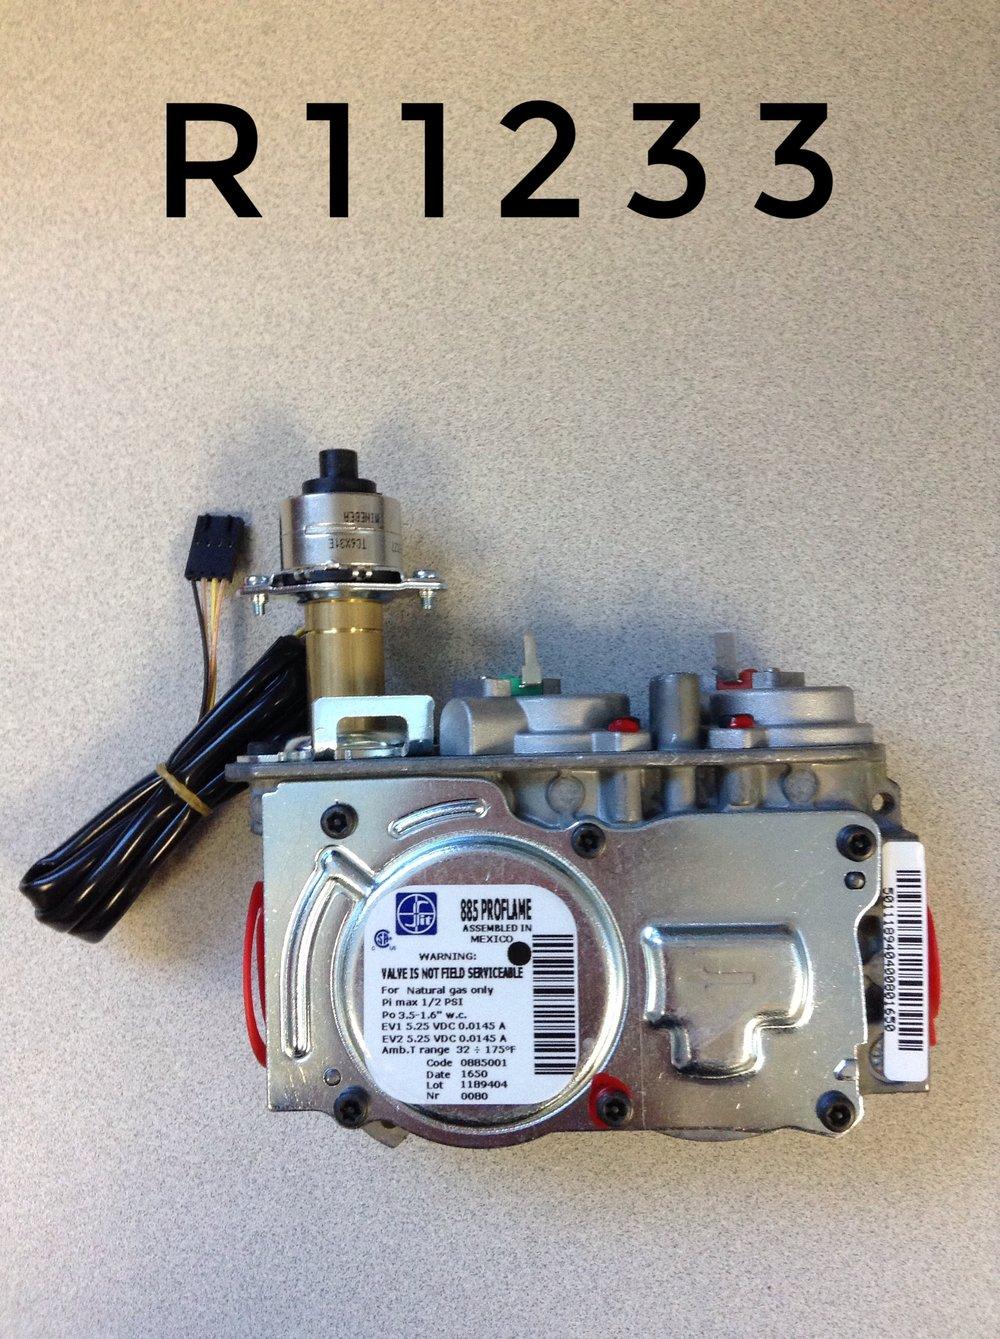 R11233.JPG